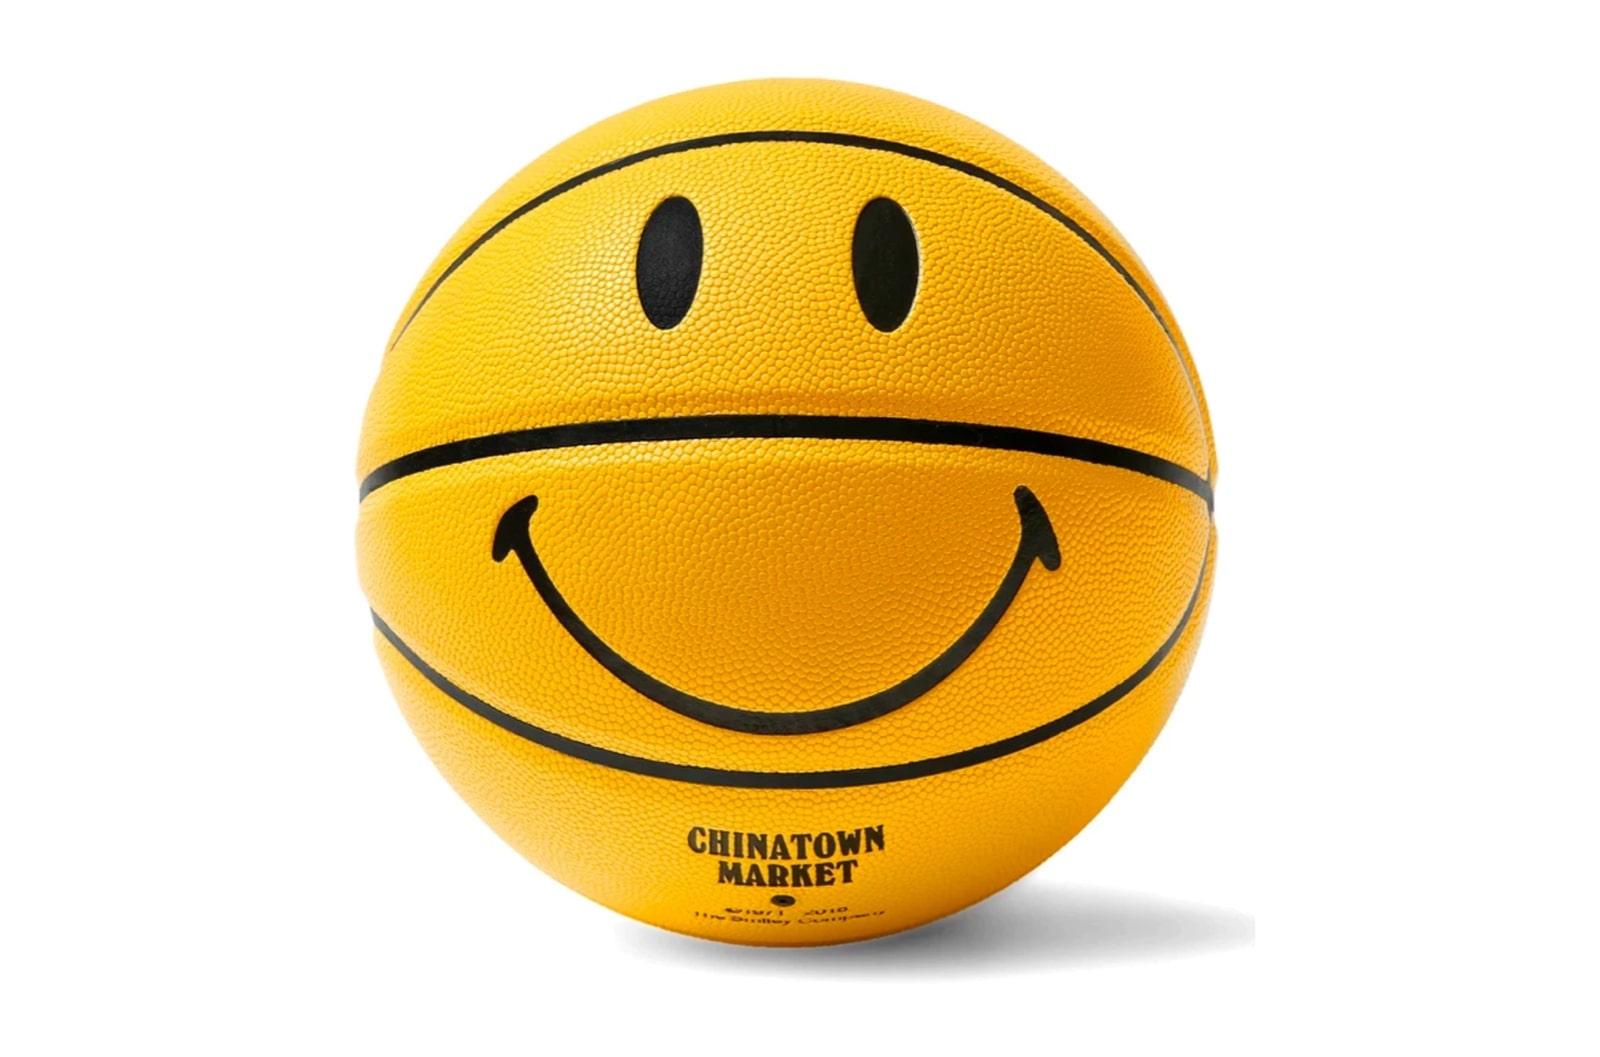 slide 1 - Smiley Yellow Basketball